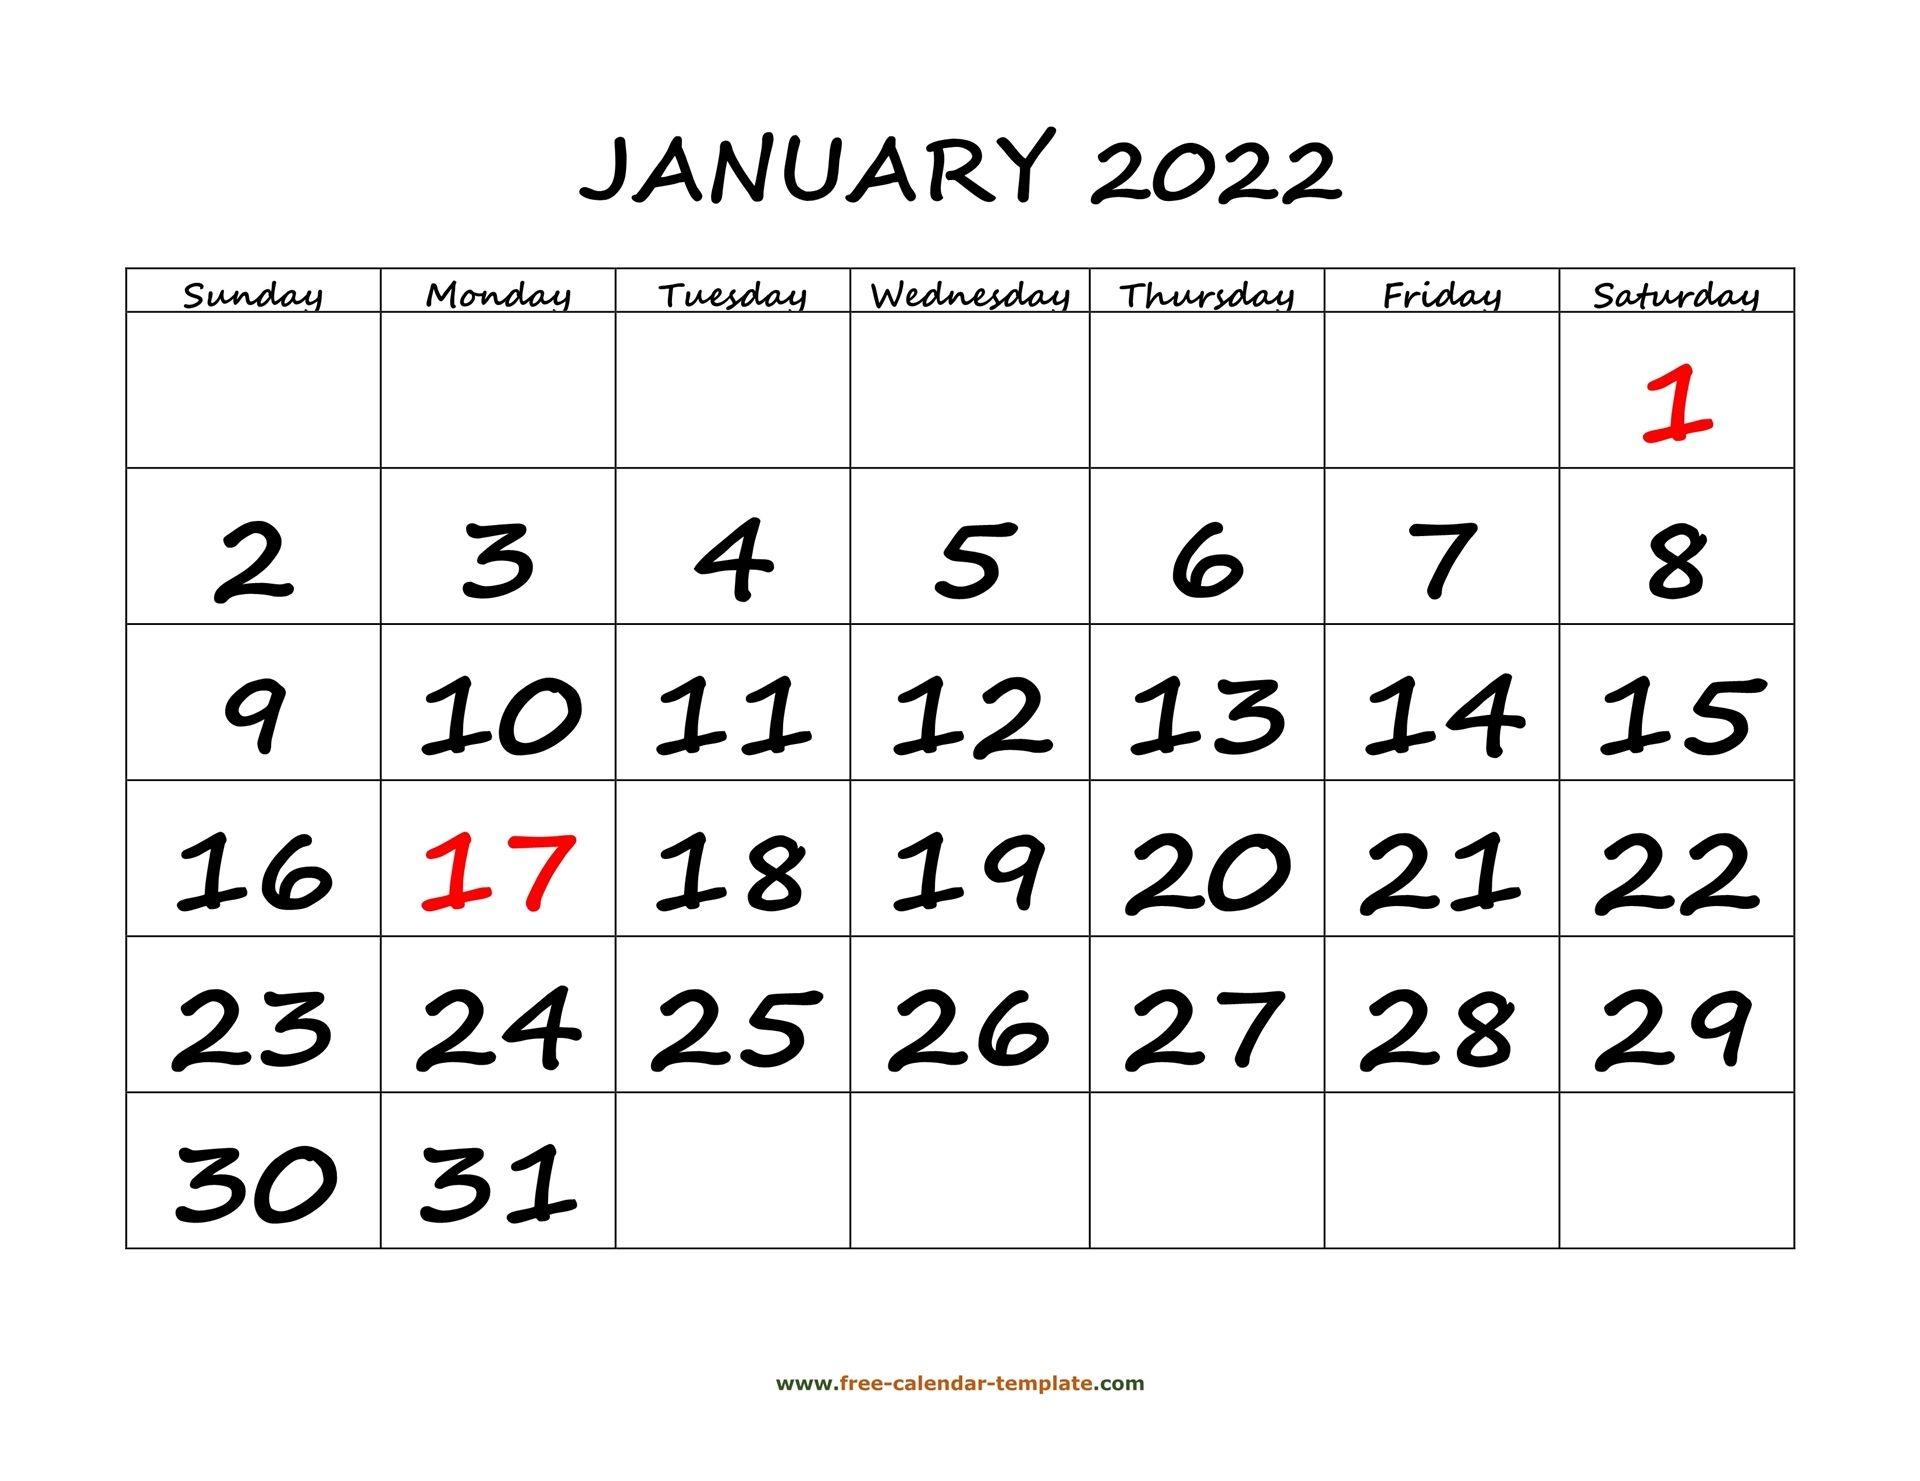 Printable Monthly Calendar 2022 | Free-Calendar-Template